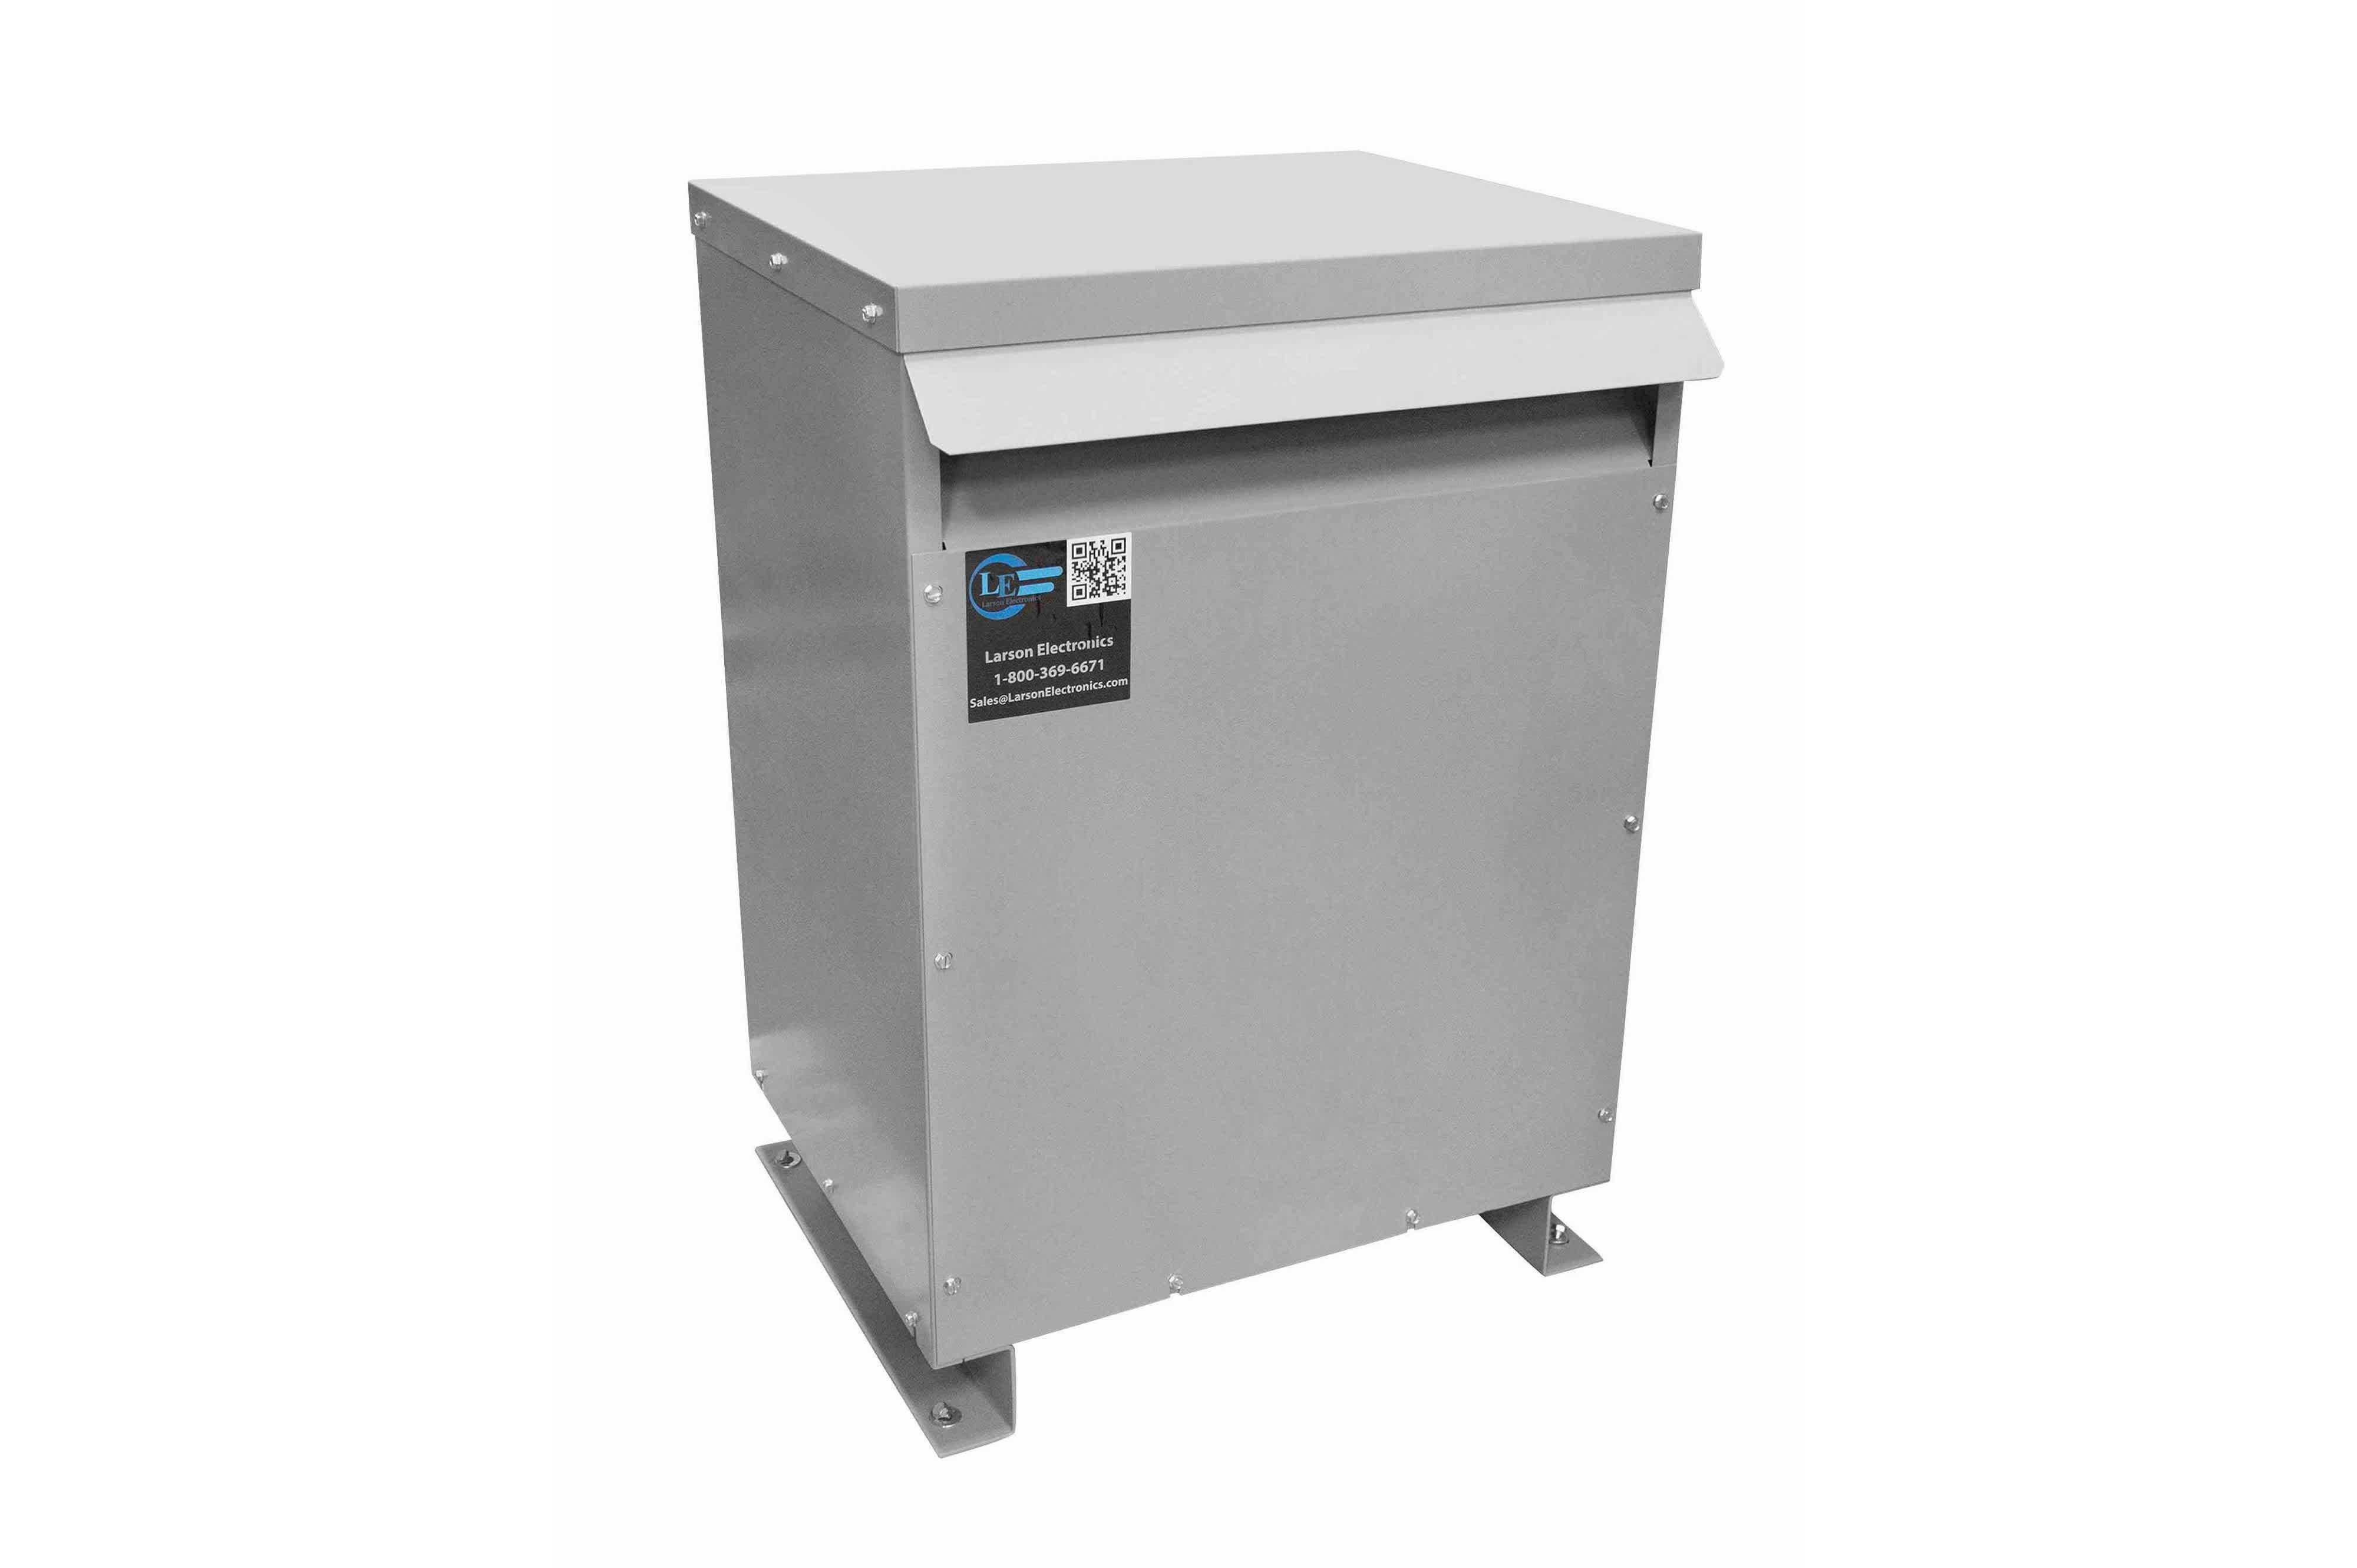 75 kVA 3PH Isolation Transformer, 575V Wye Primary, 208V Delta Secondary, N3R, Ventilated, 60 Hz